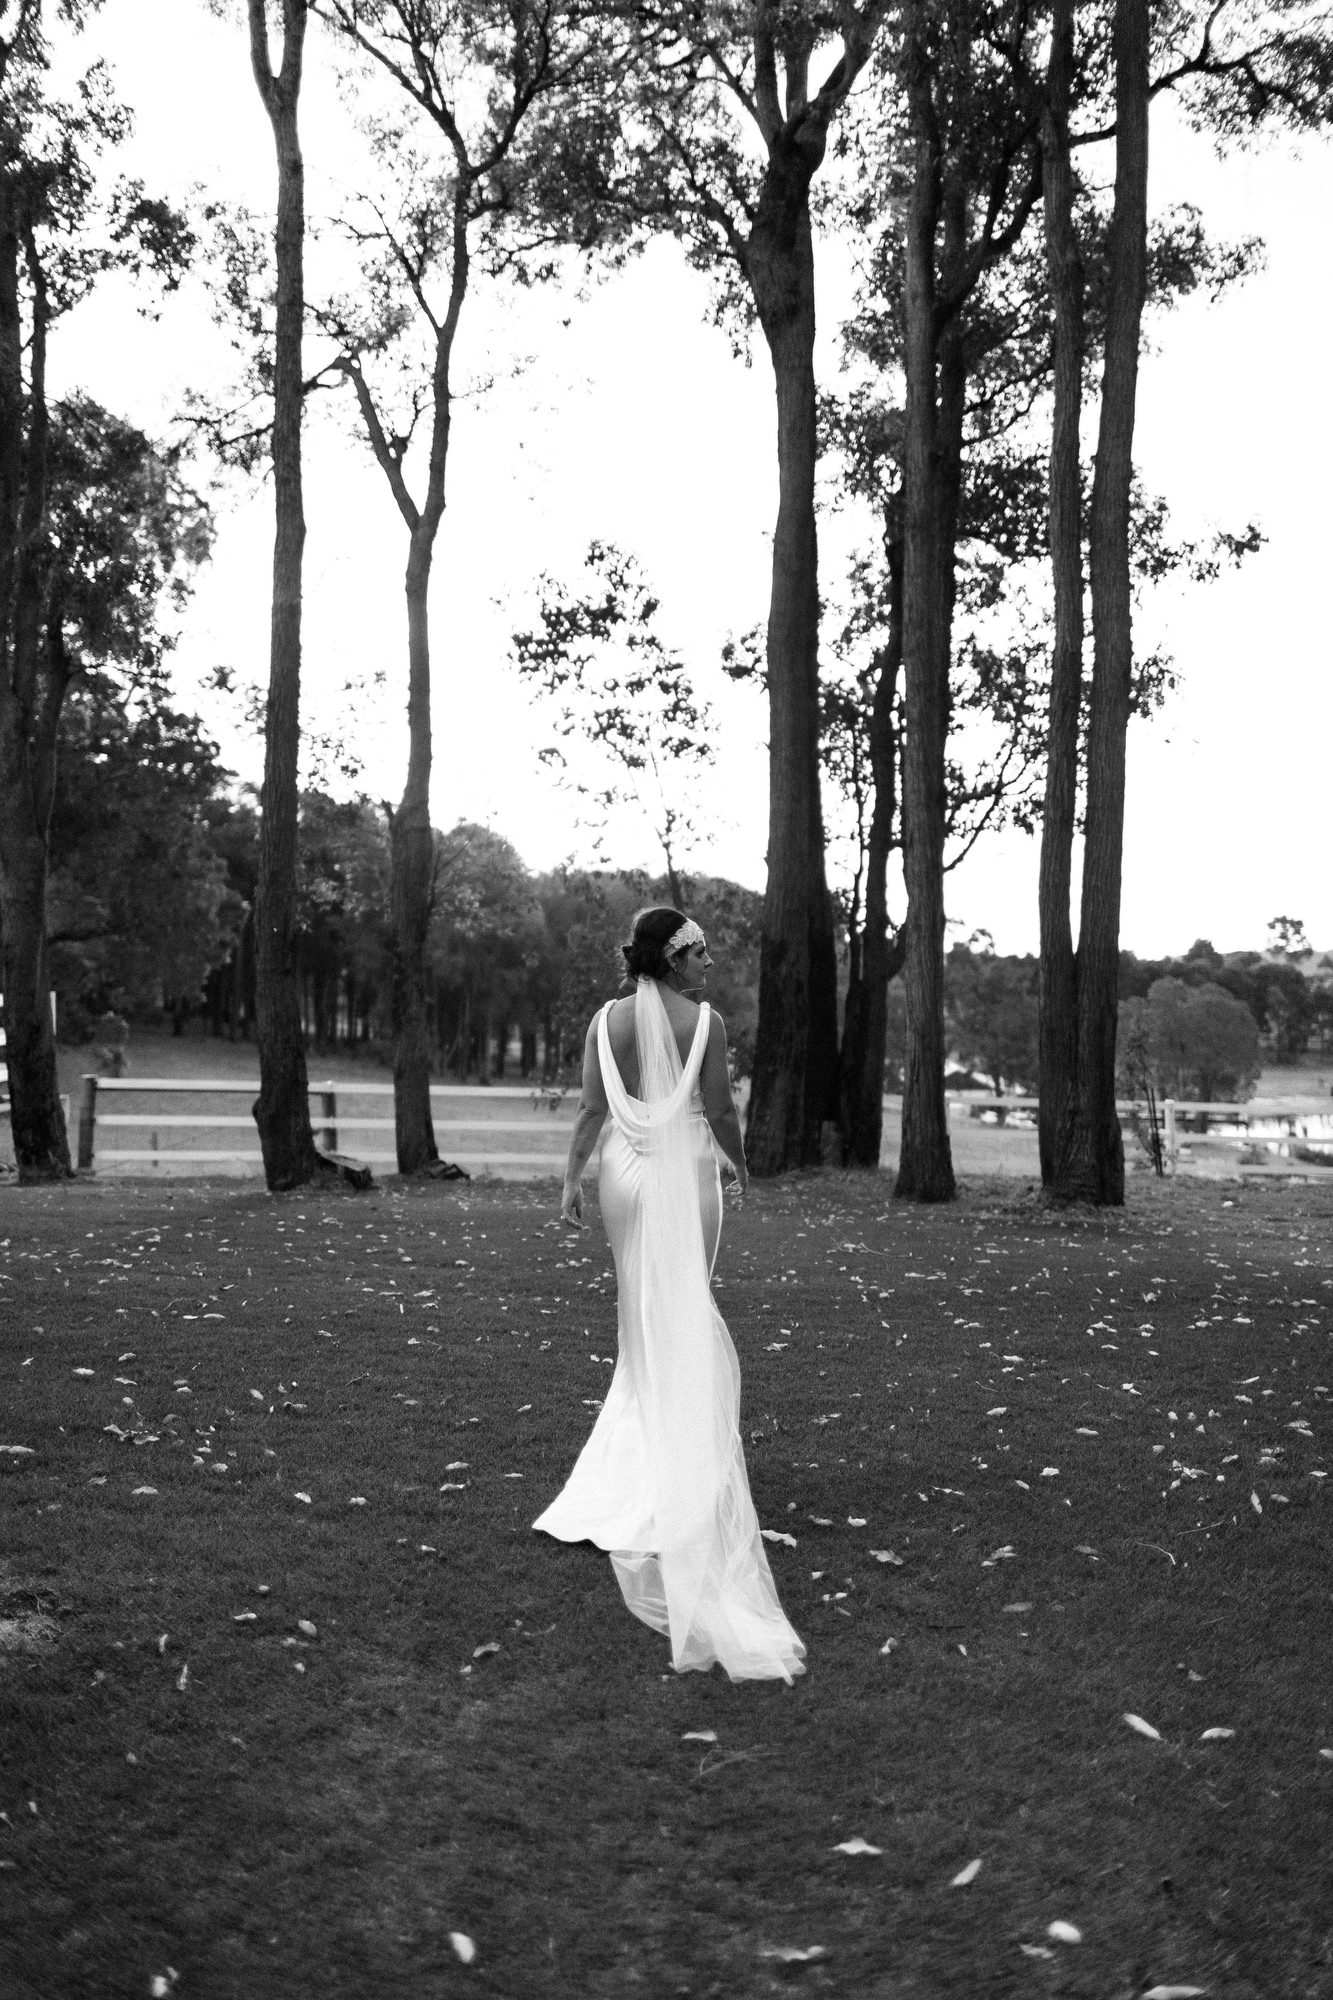 CLARK-WEDDING-EDITH-VALLEY-CARTER-ROSE-PHOTOGRAPHY-521.JPG